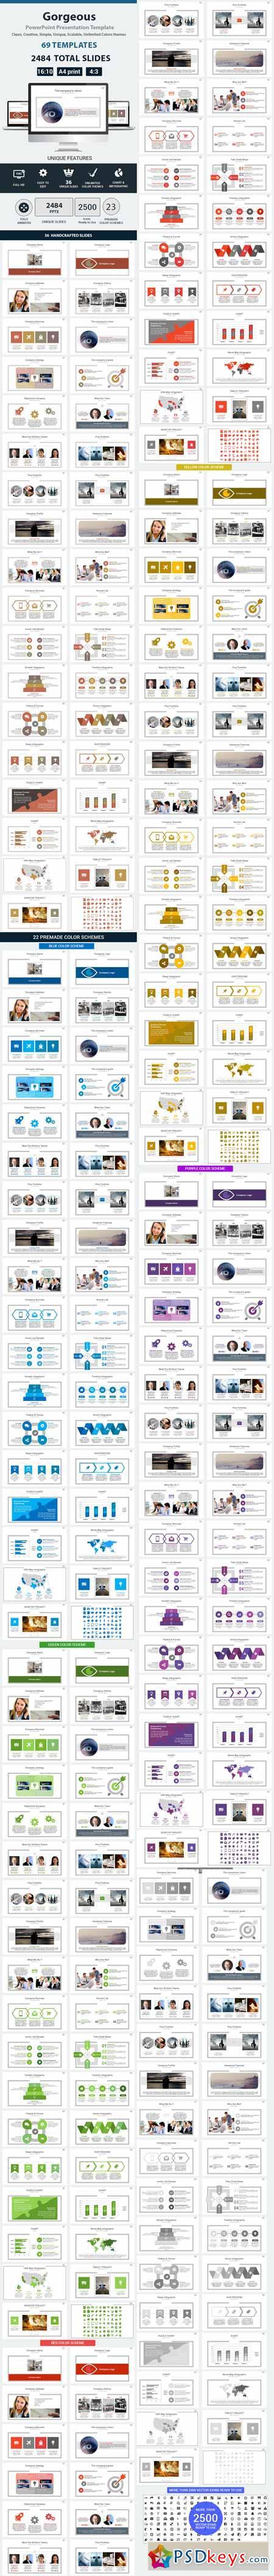 Gorgeous PowerPoint Presentation Template 12719873